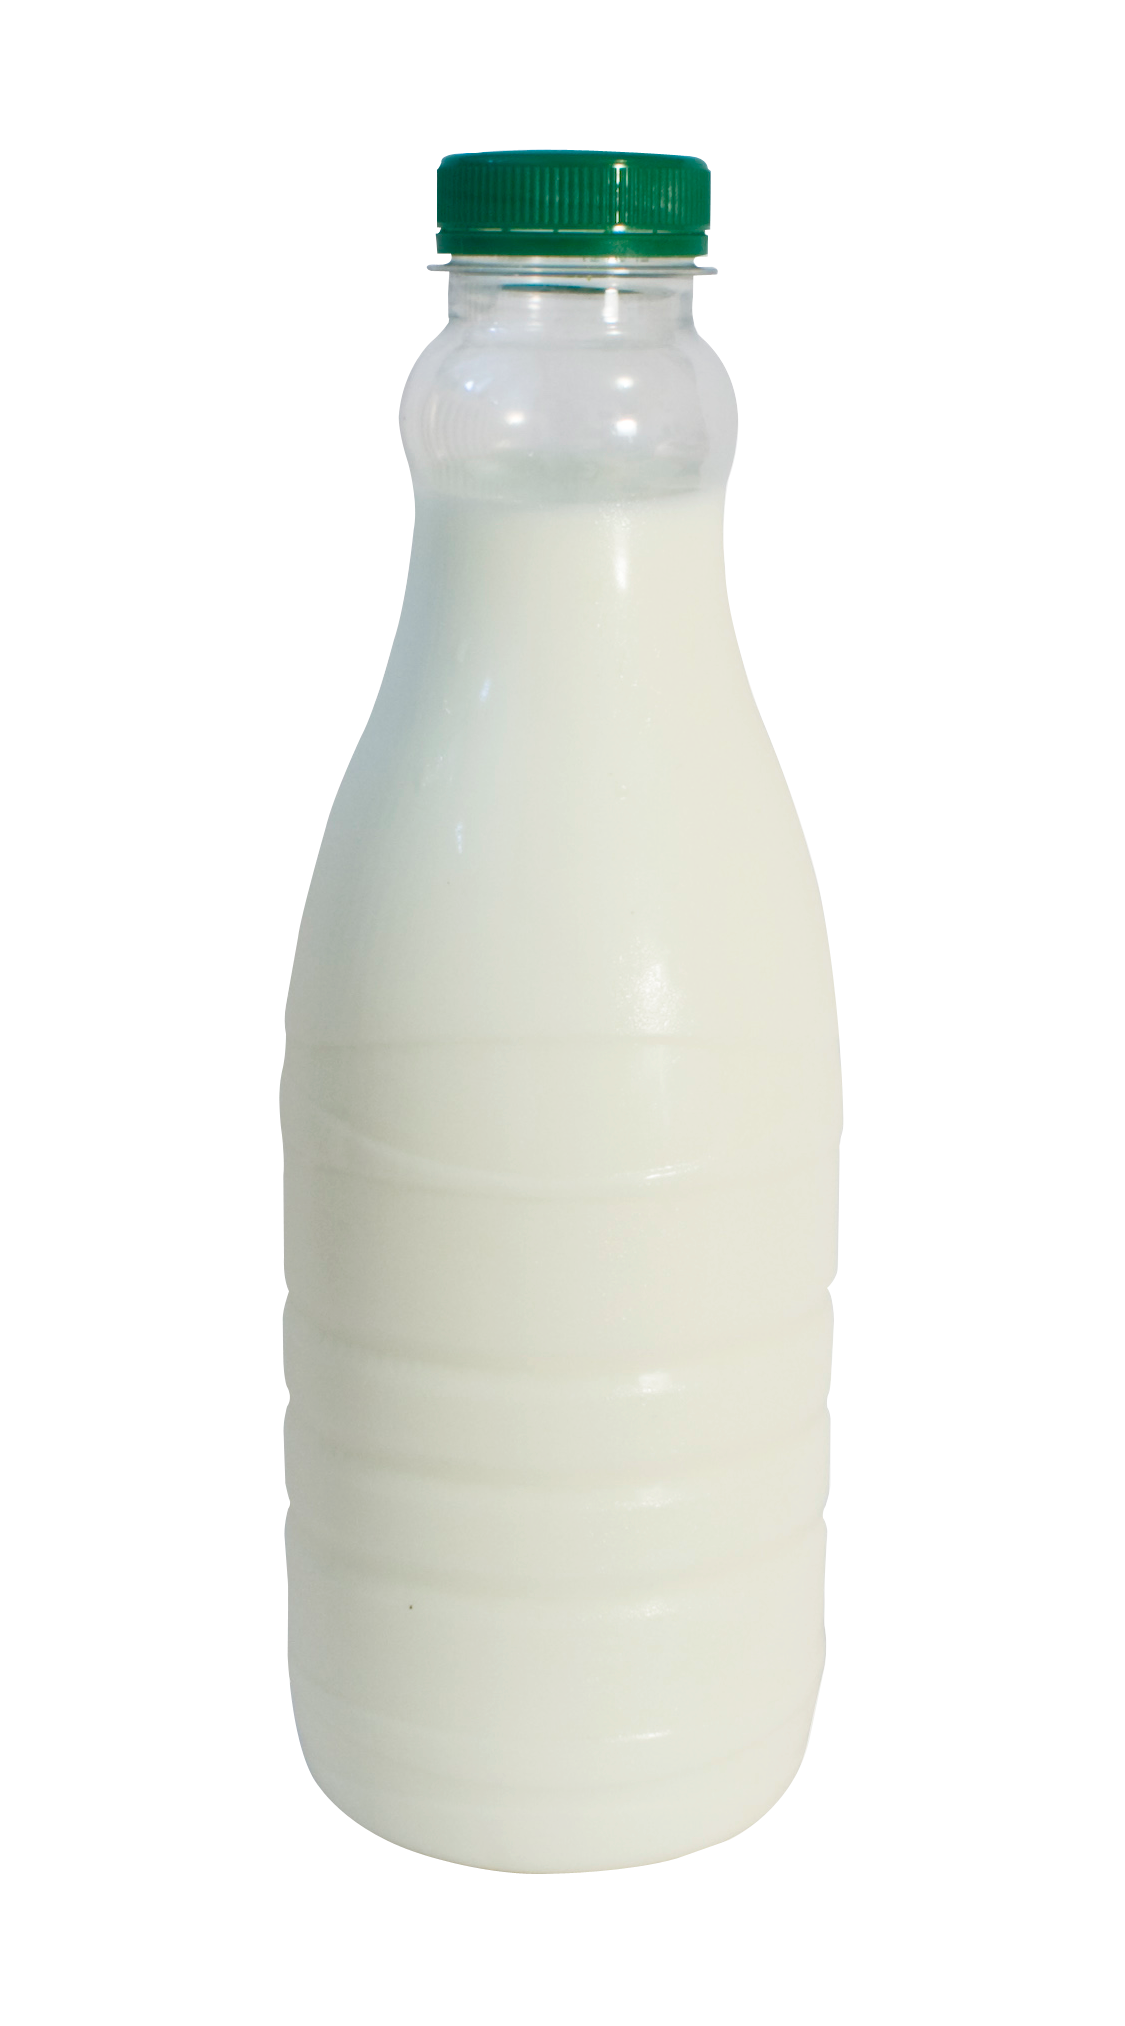 PNG Milk Bottle - 78755